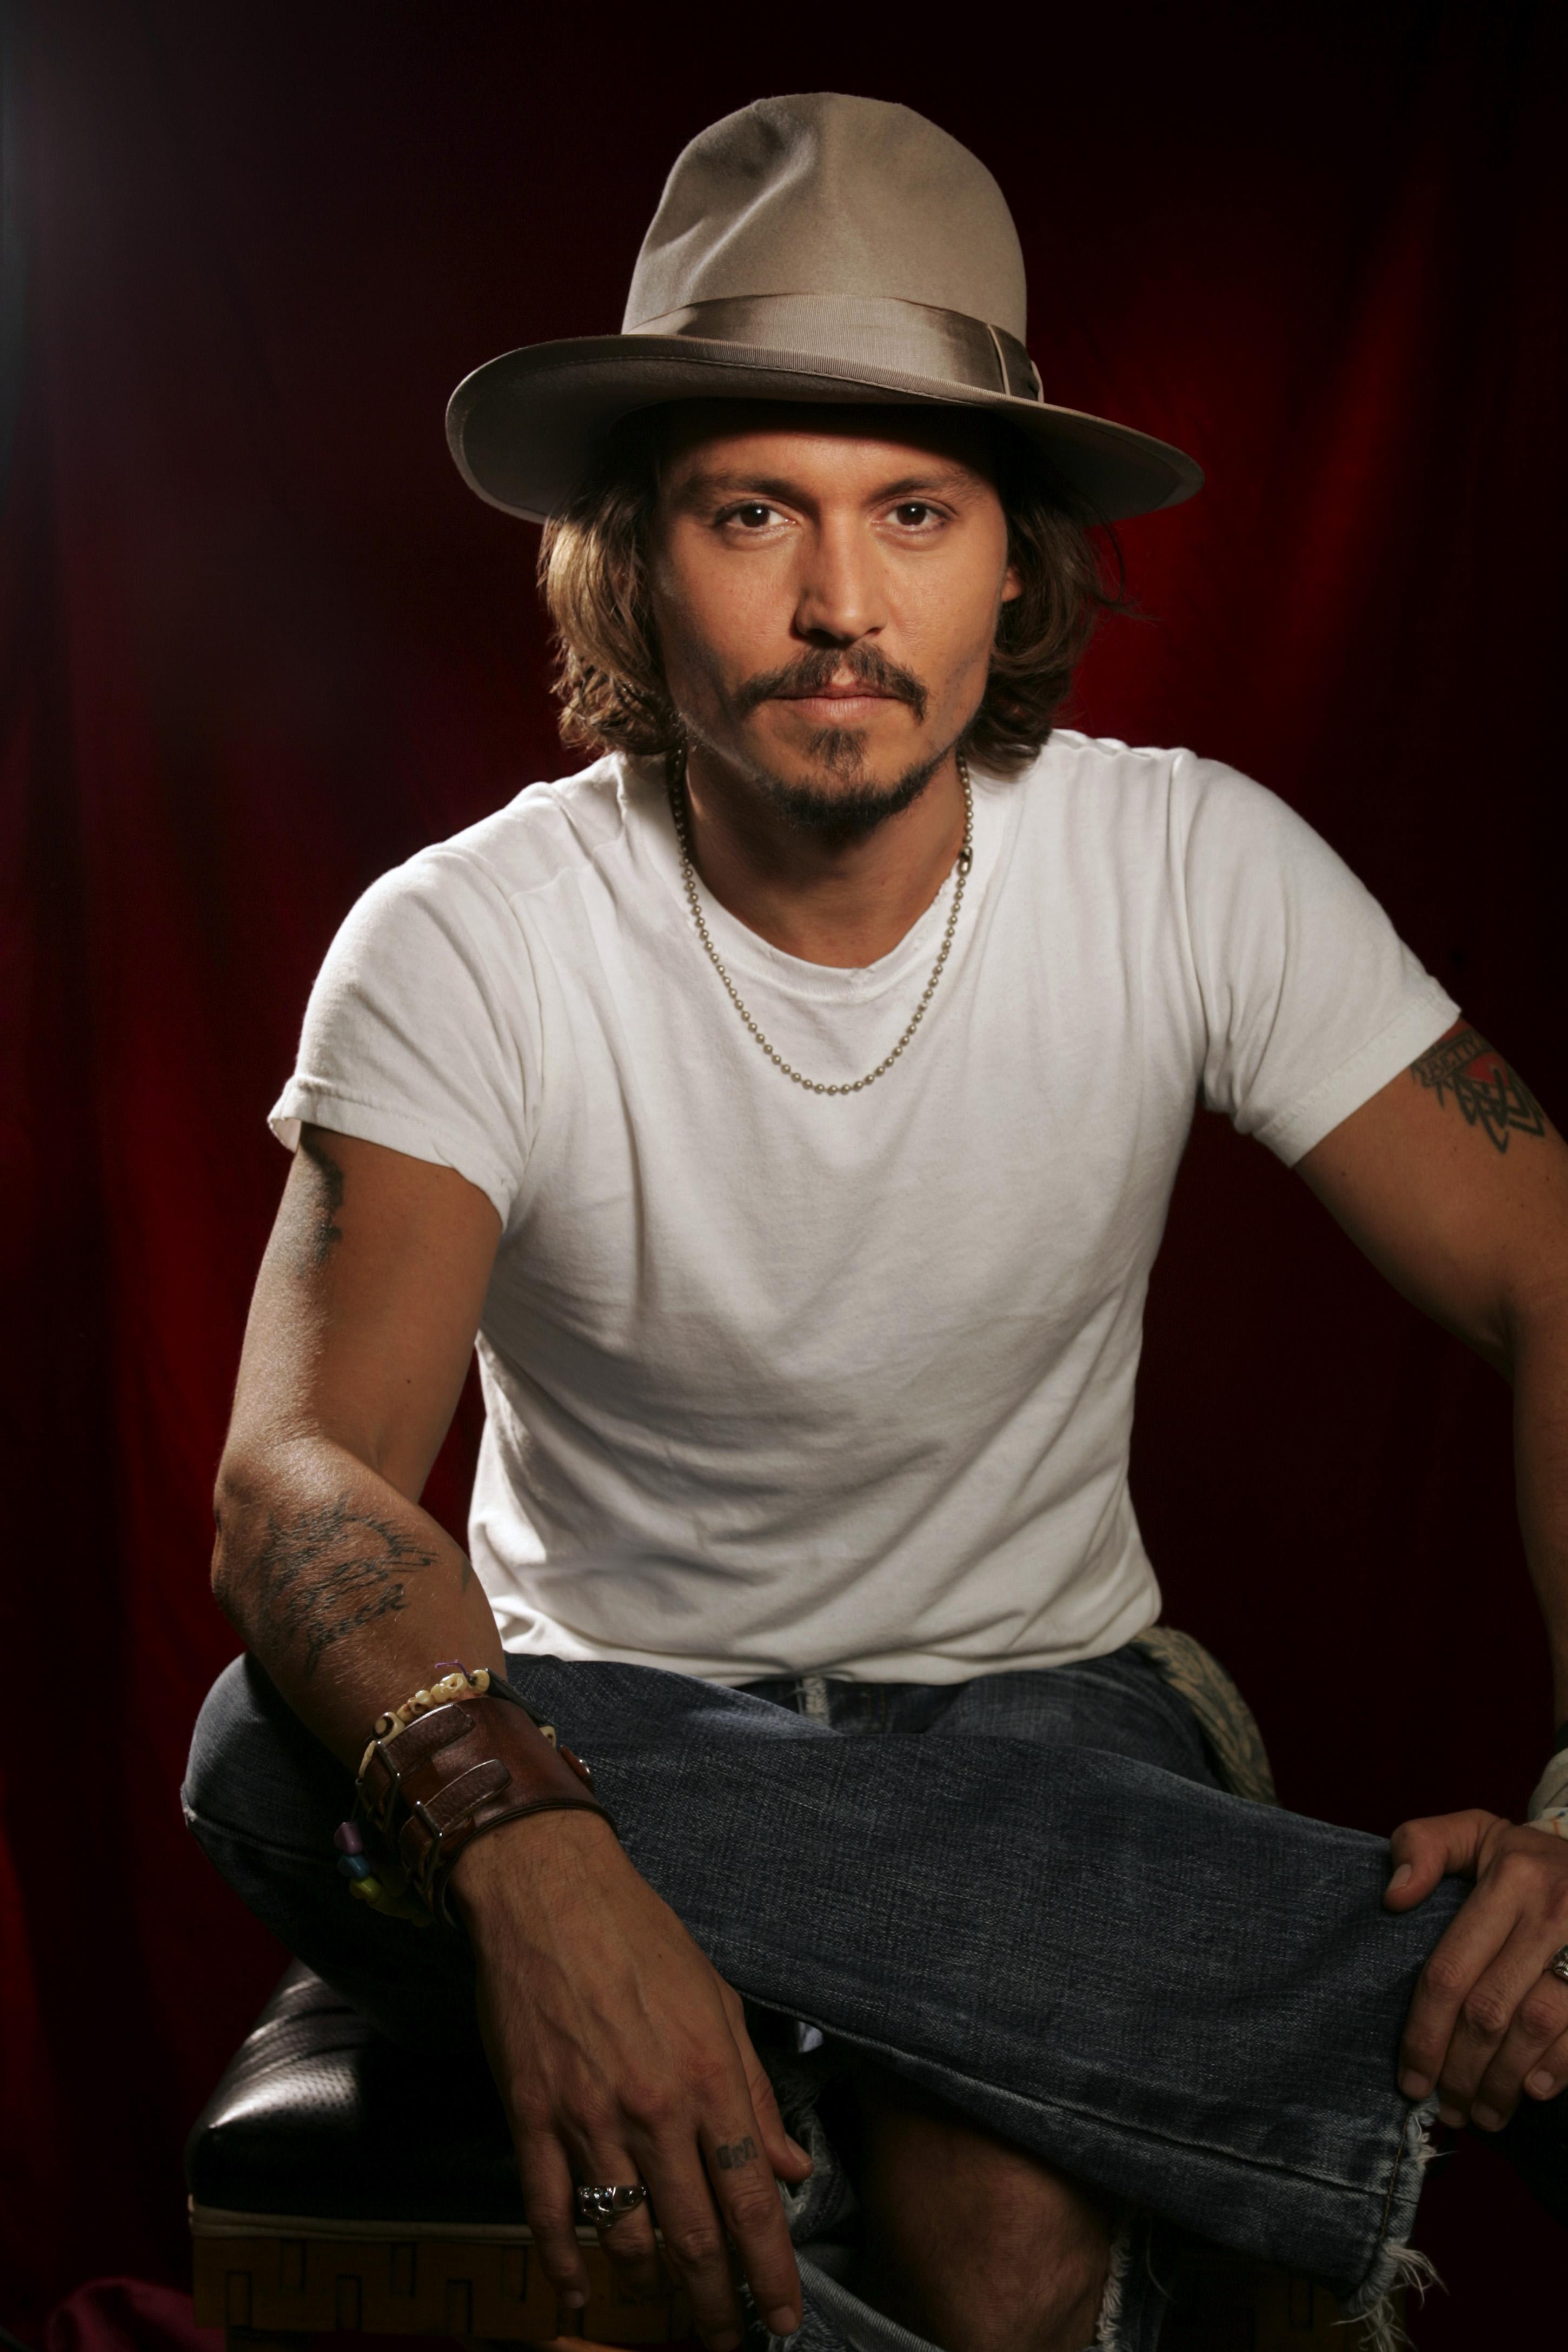 Johnny Depp - Johnny Depp Photo (32658858) - Fanpop